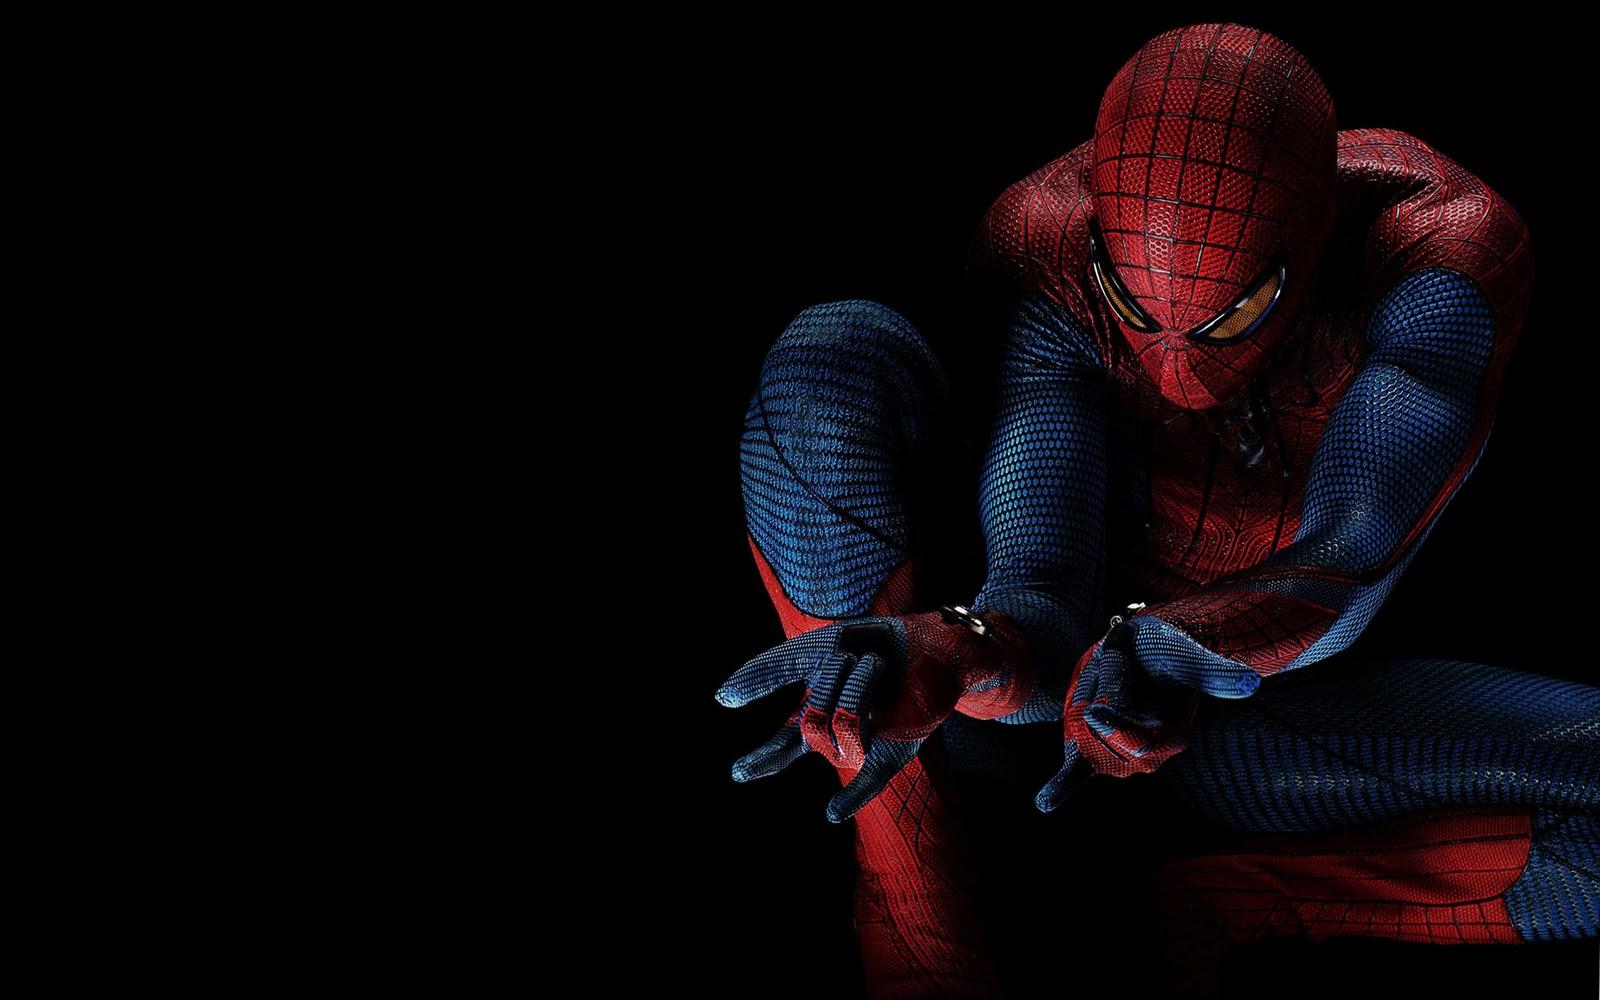 Spider man movie 2012 new wallpapers - New spiderman movie wallpaper ...